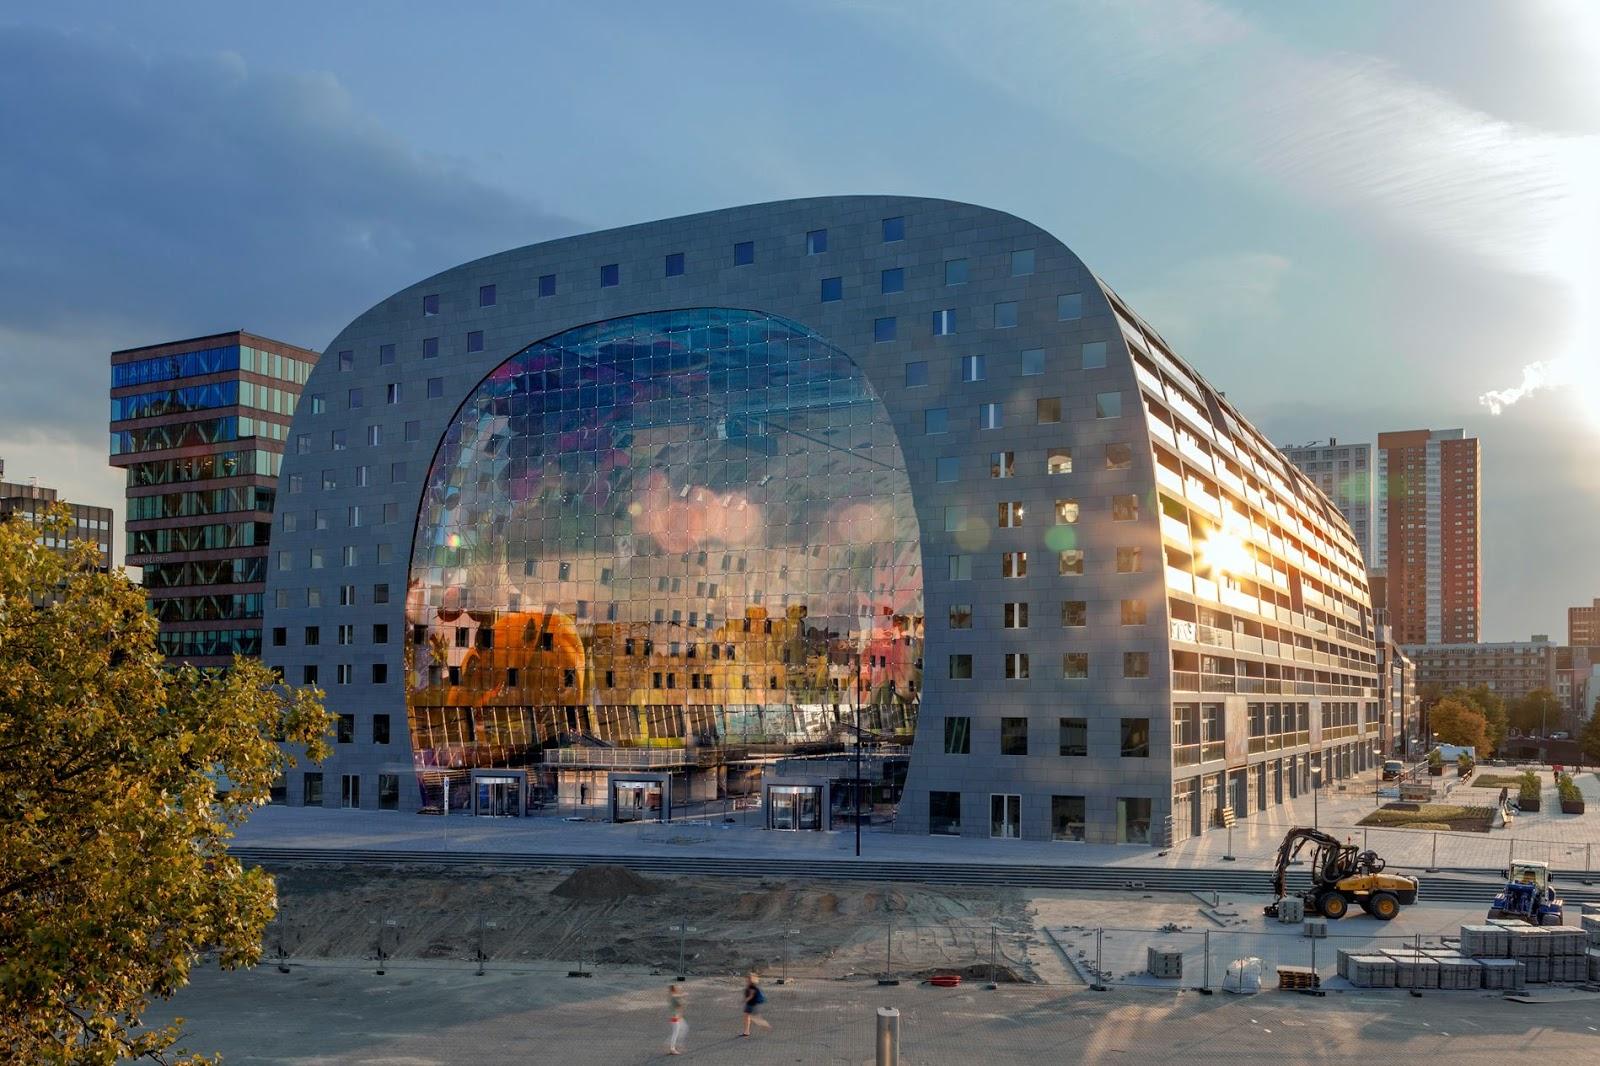 mvrdv market hall rotterdam - photo #12